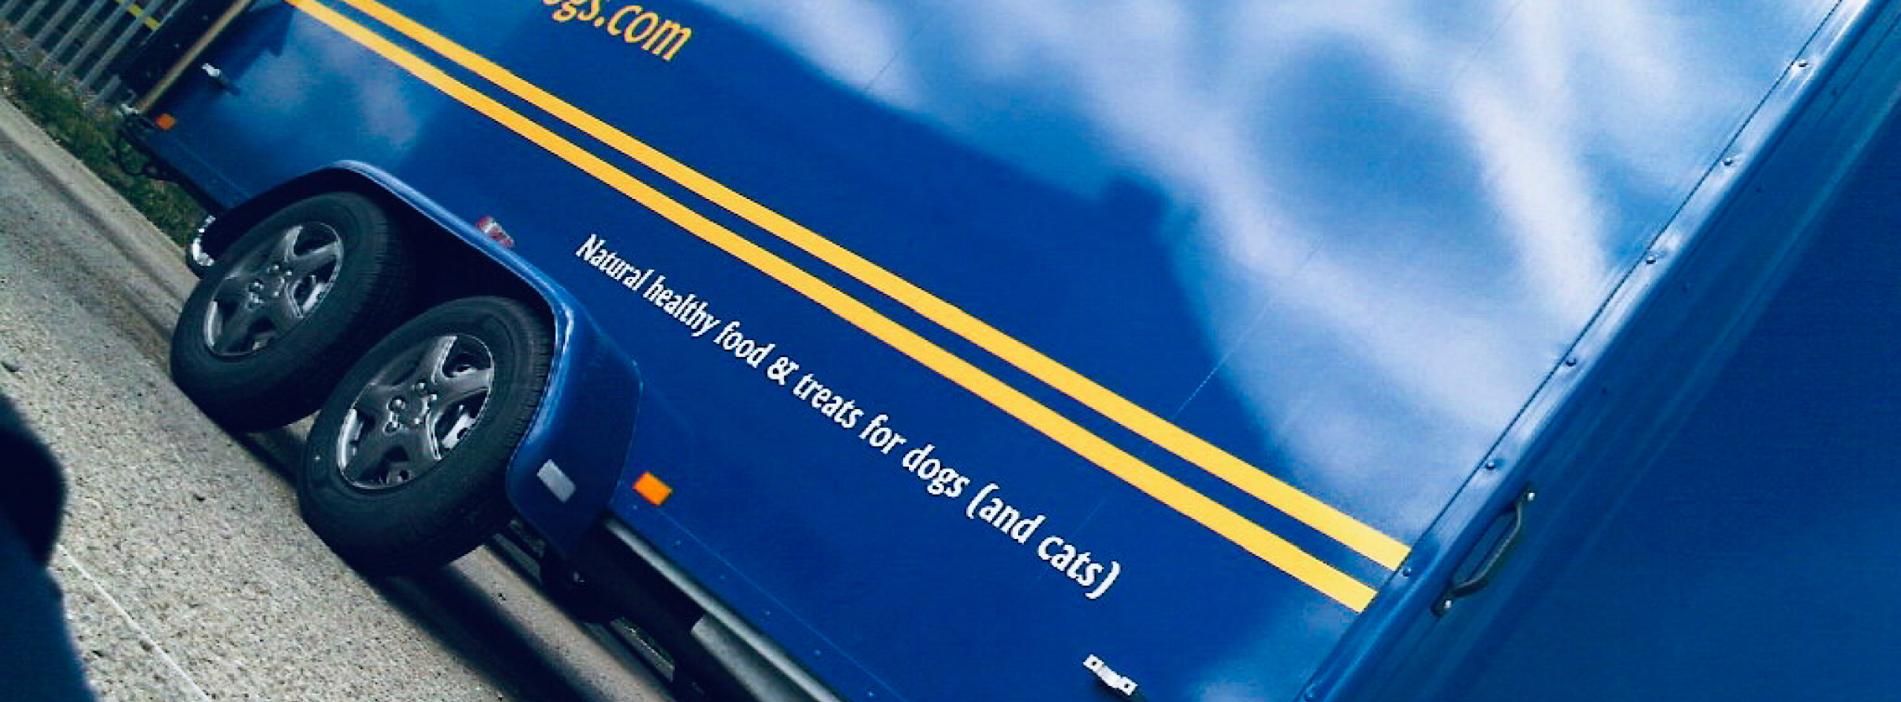 contract exhibition services boxer exhibition trailers